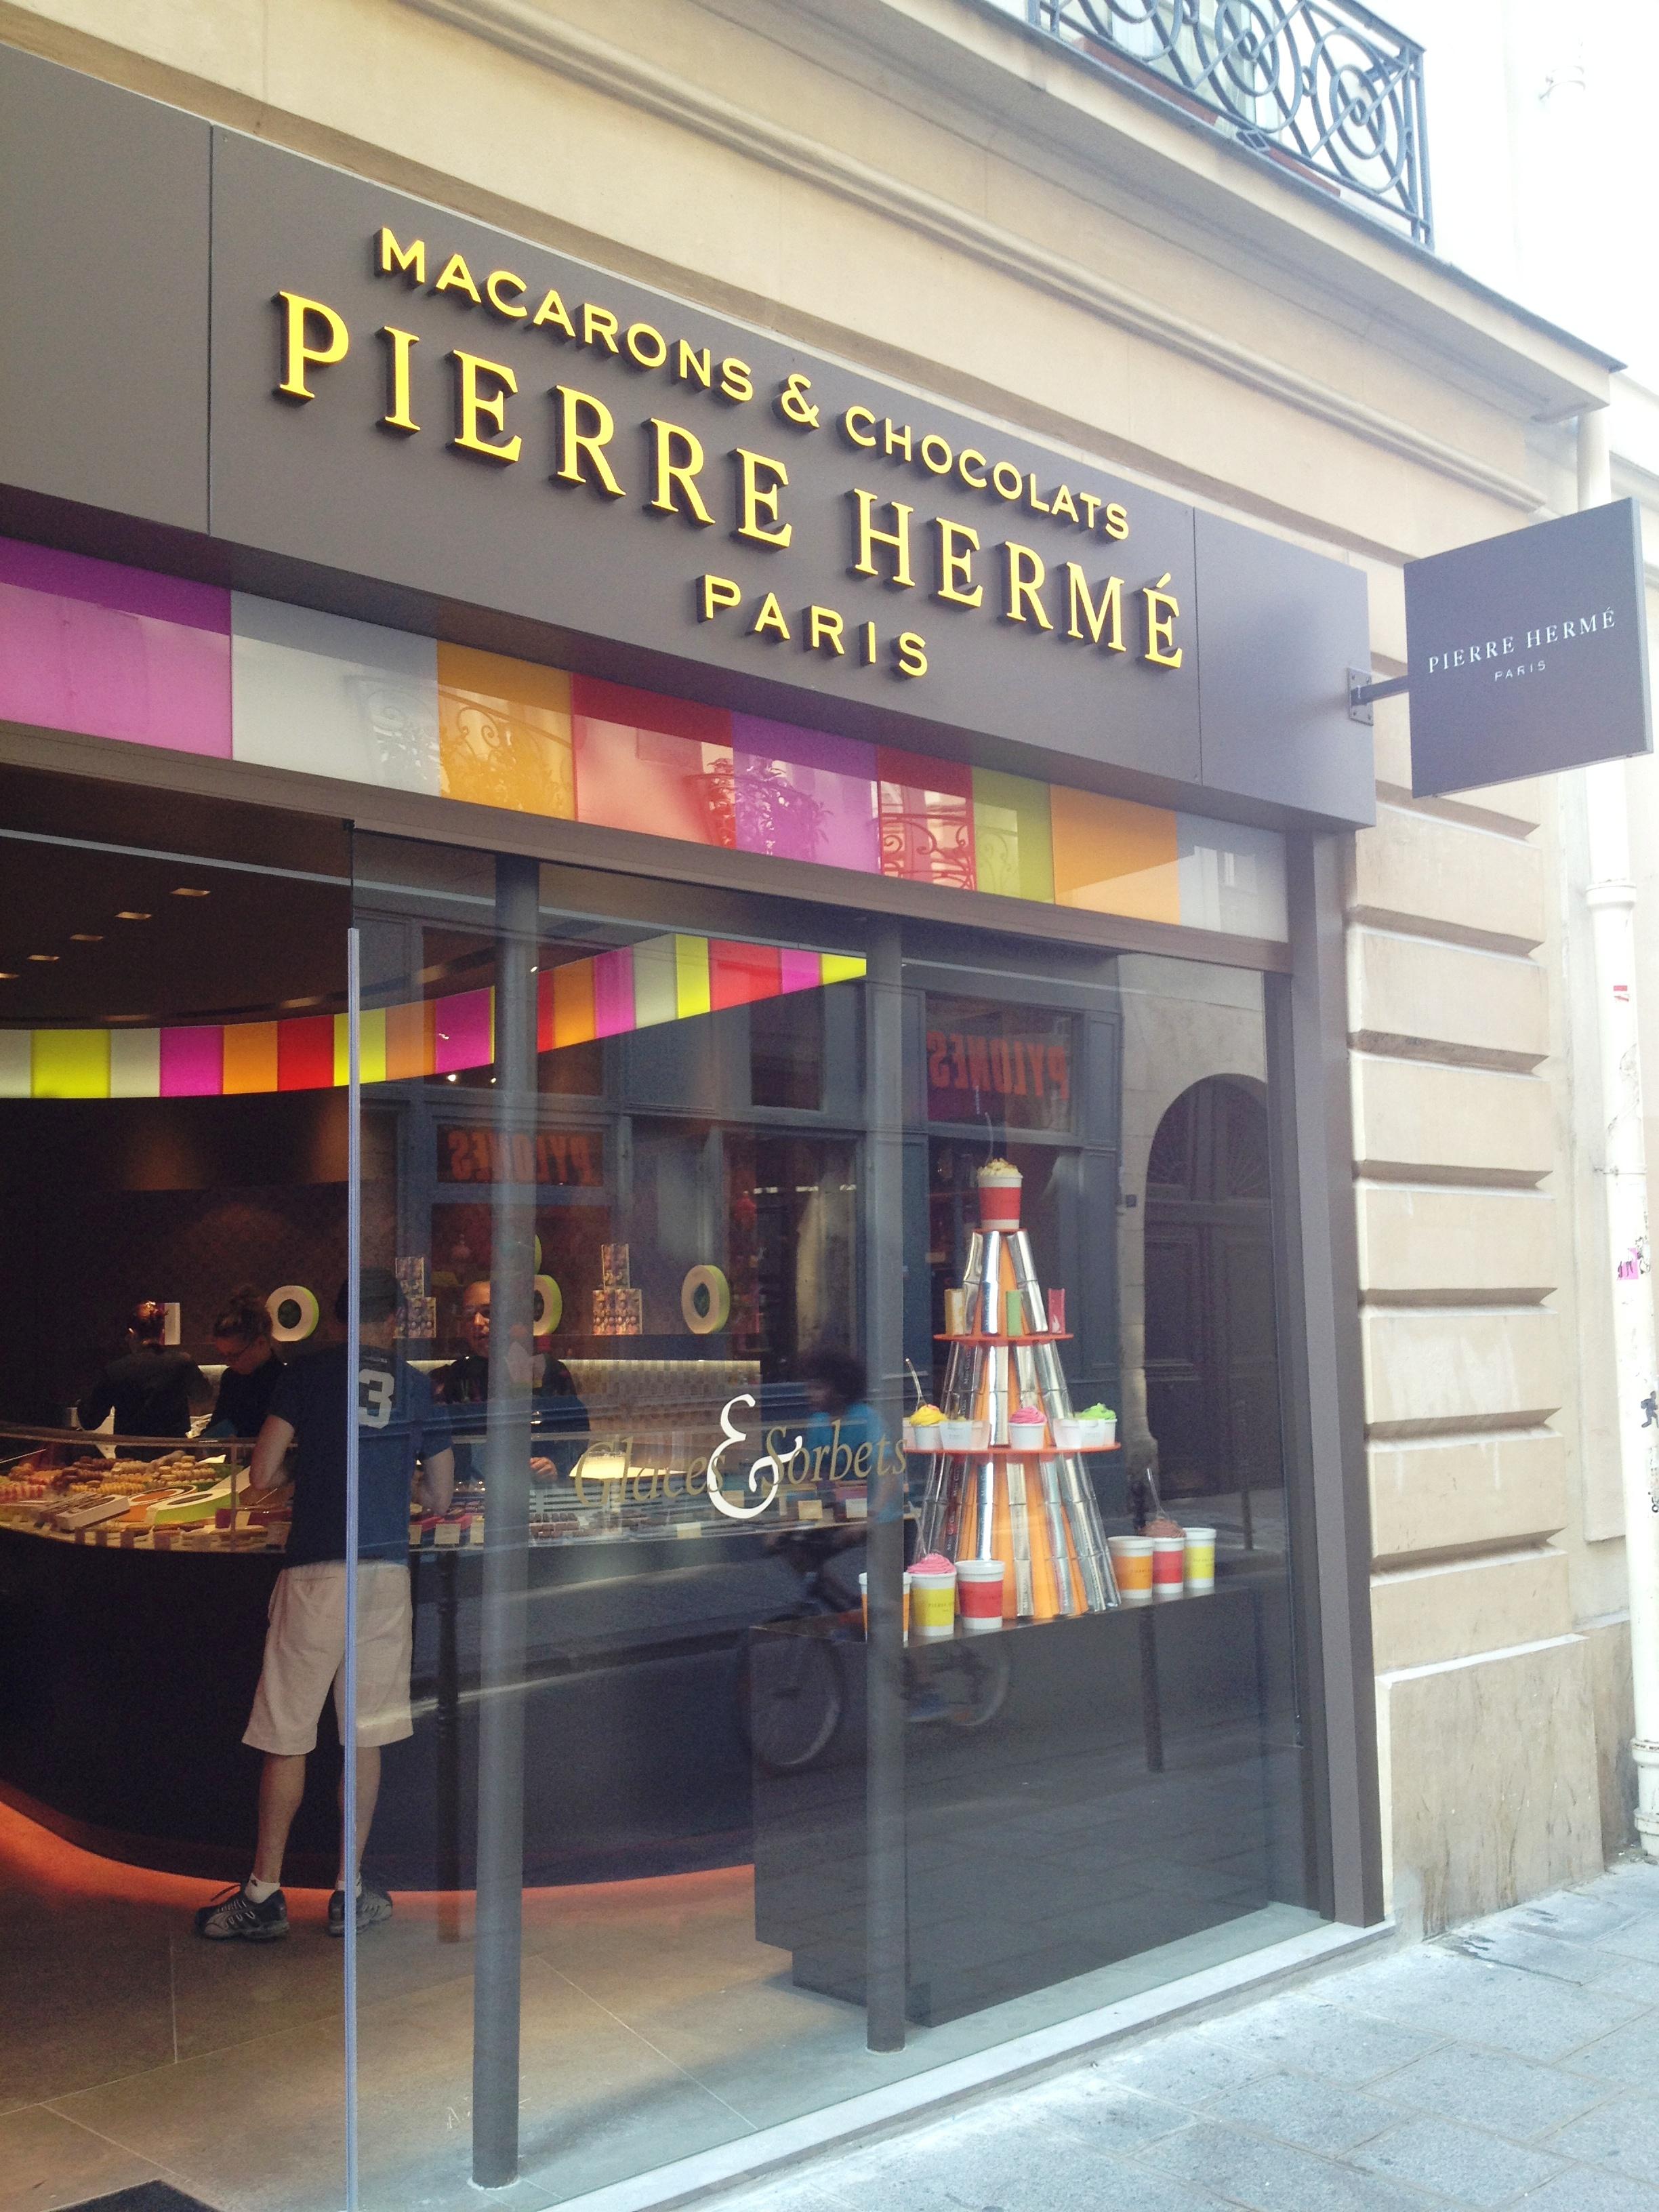 pierre-herme-store-marais.jpg